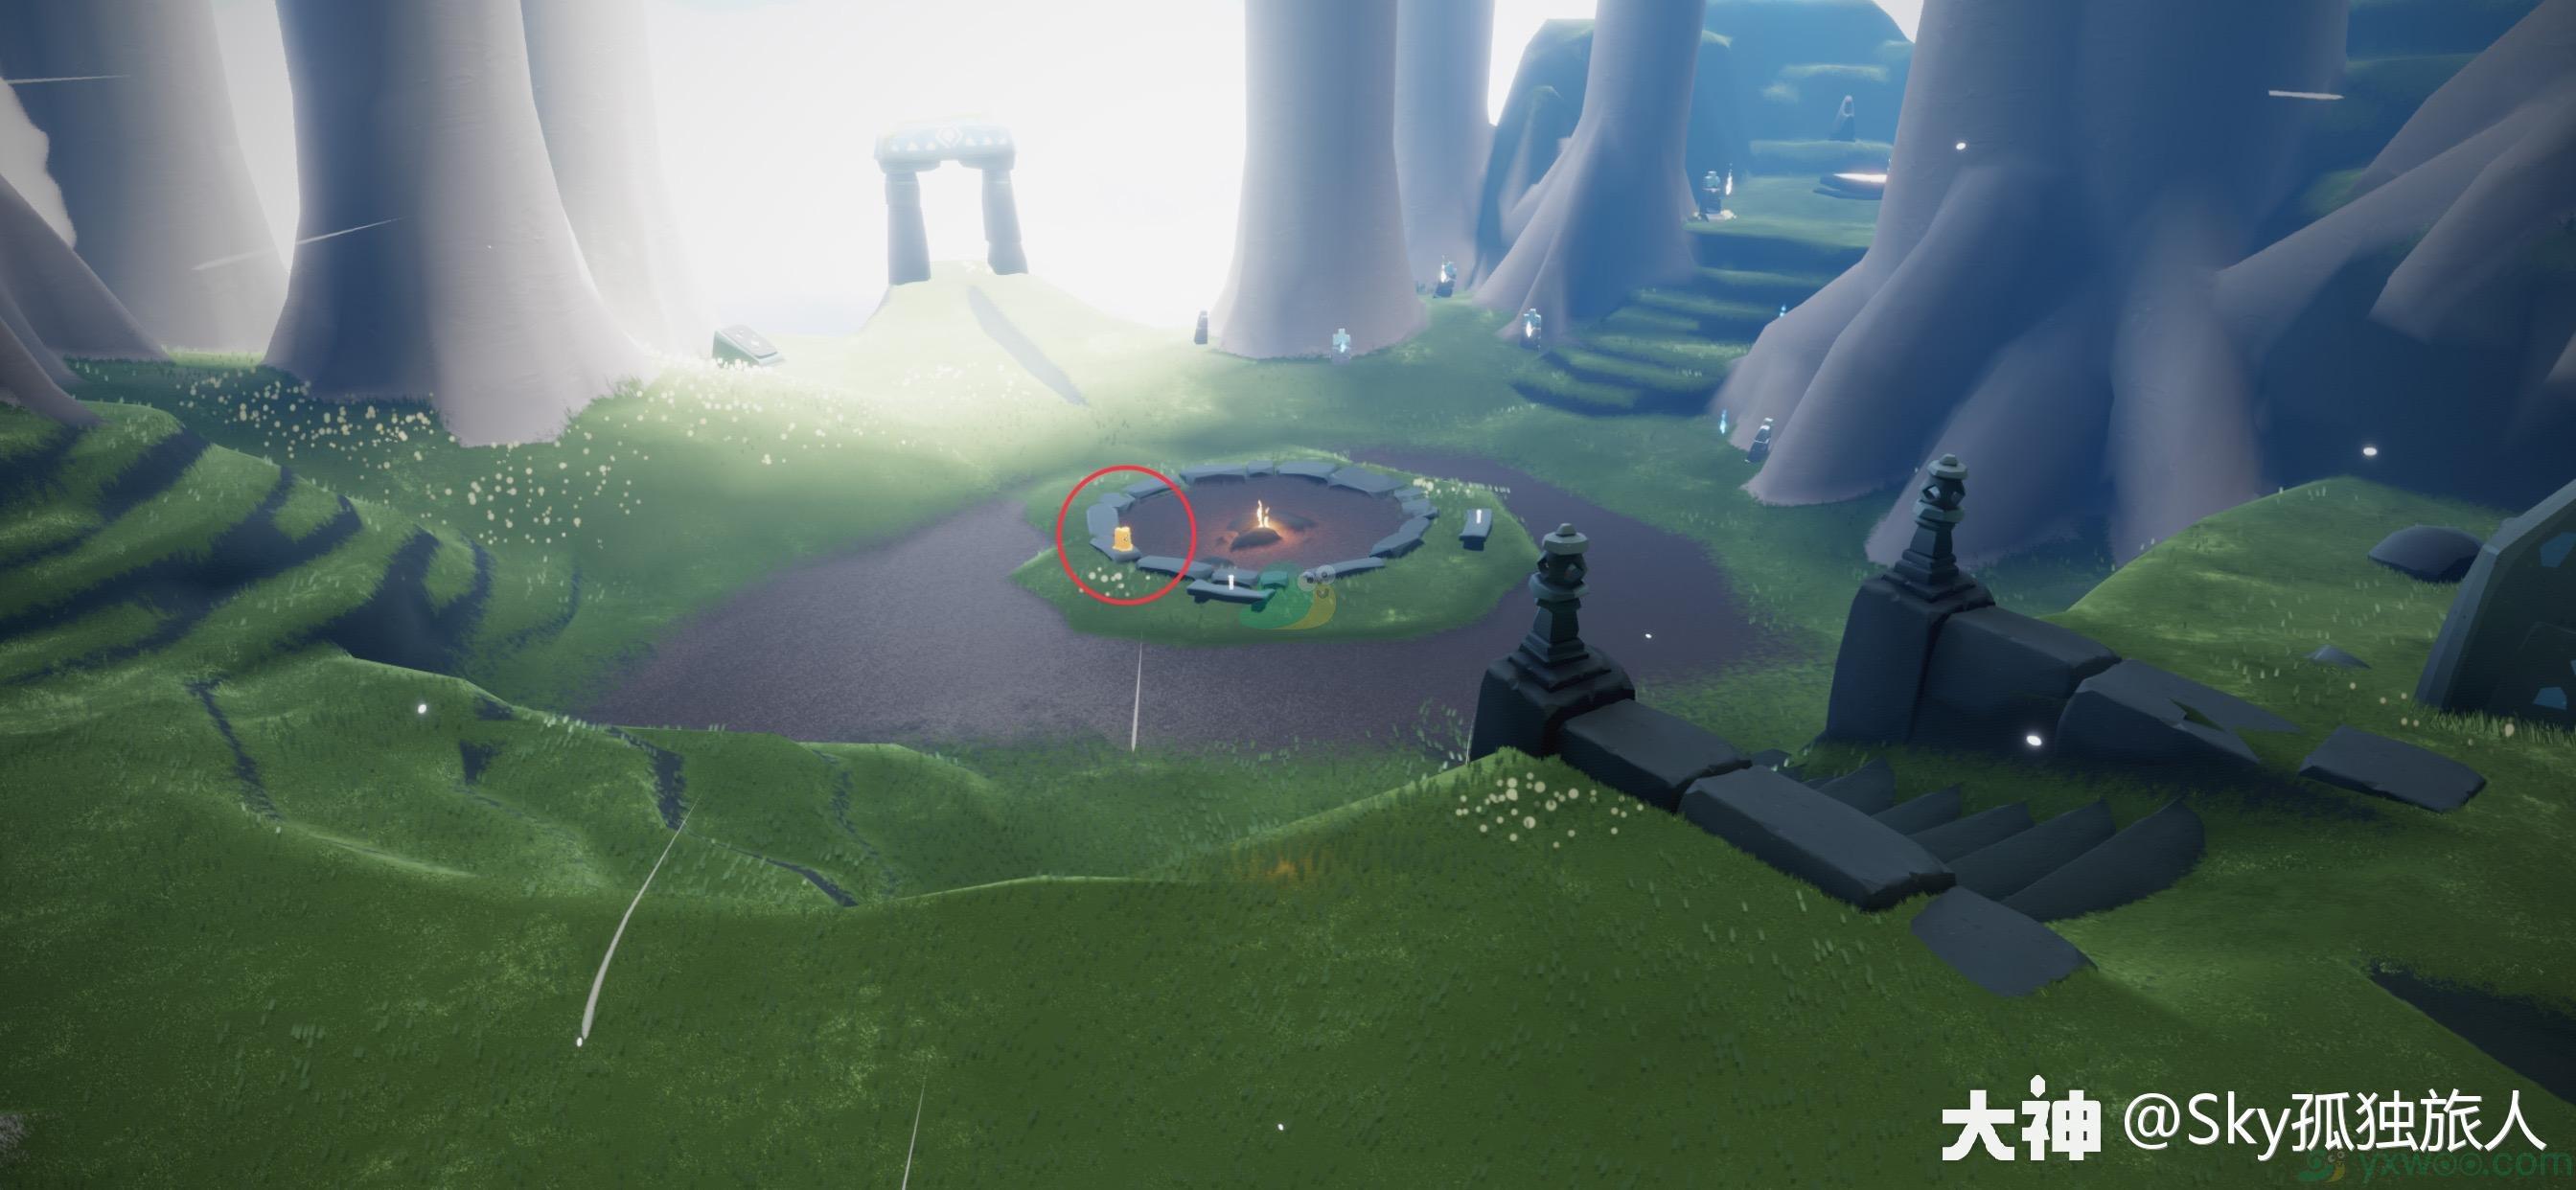 2021《sky光遇》7月28日季节蜡烛位置介绍